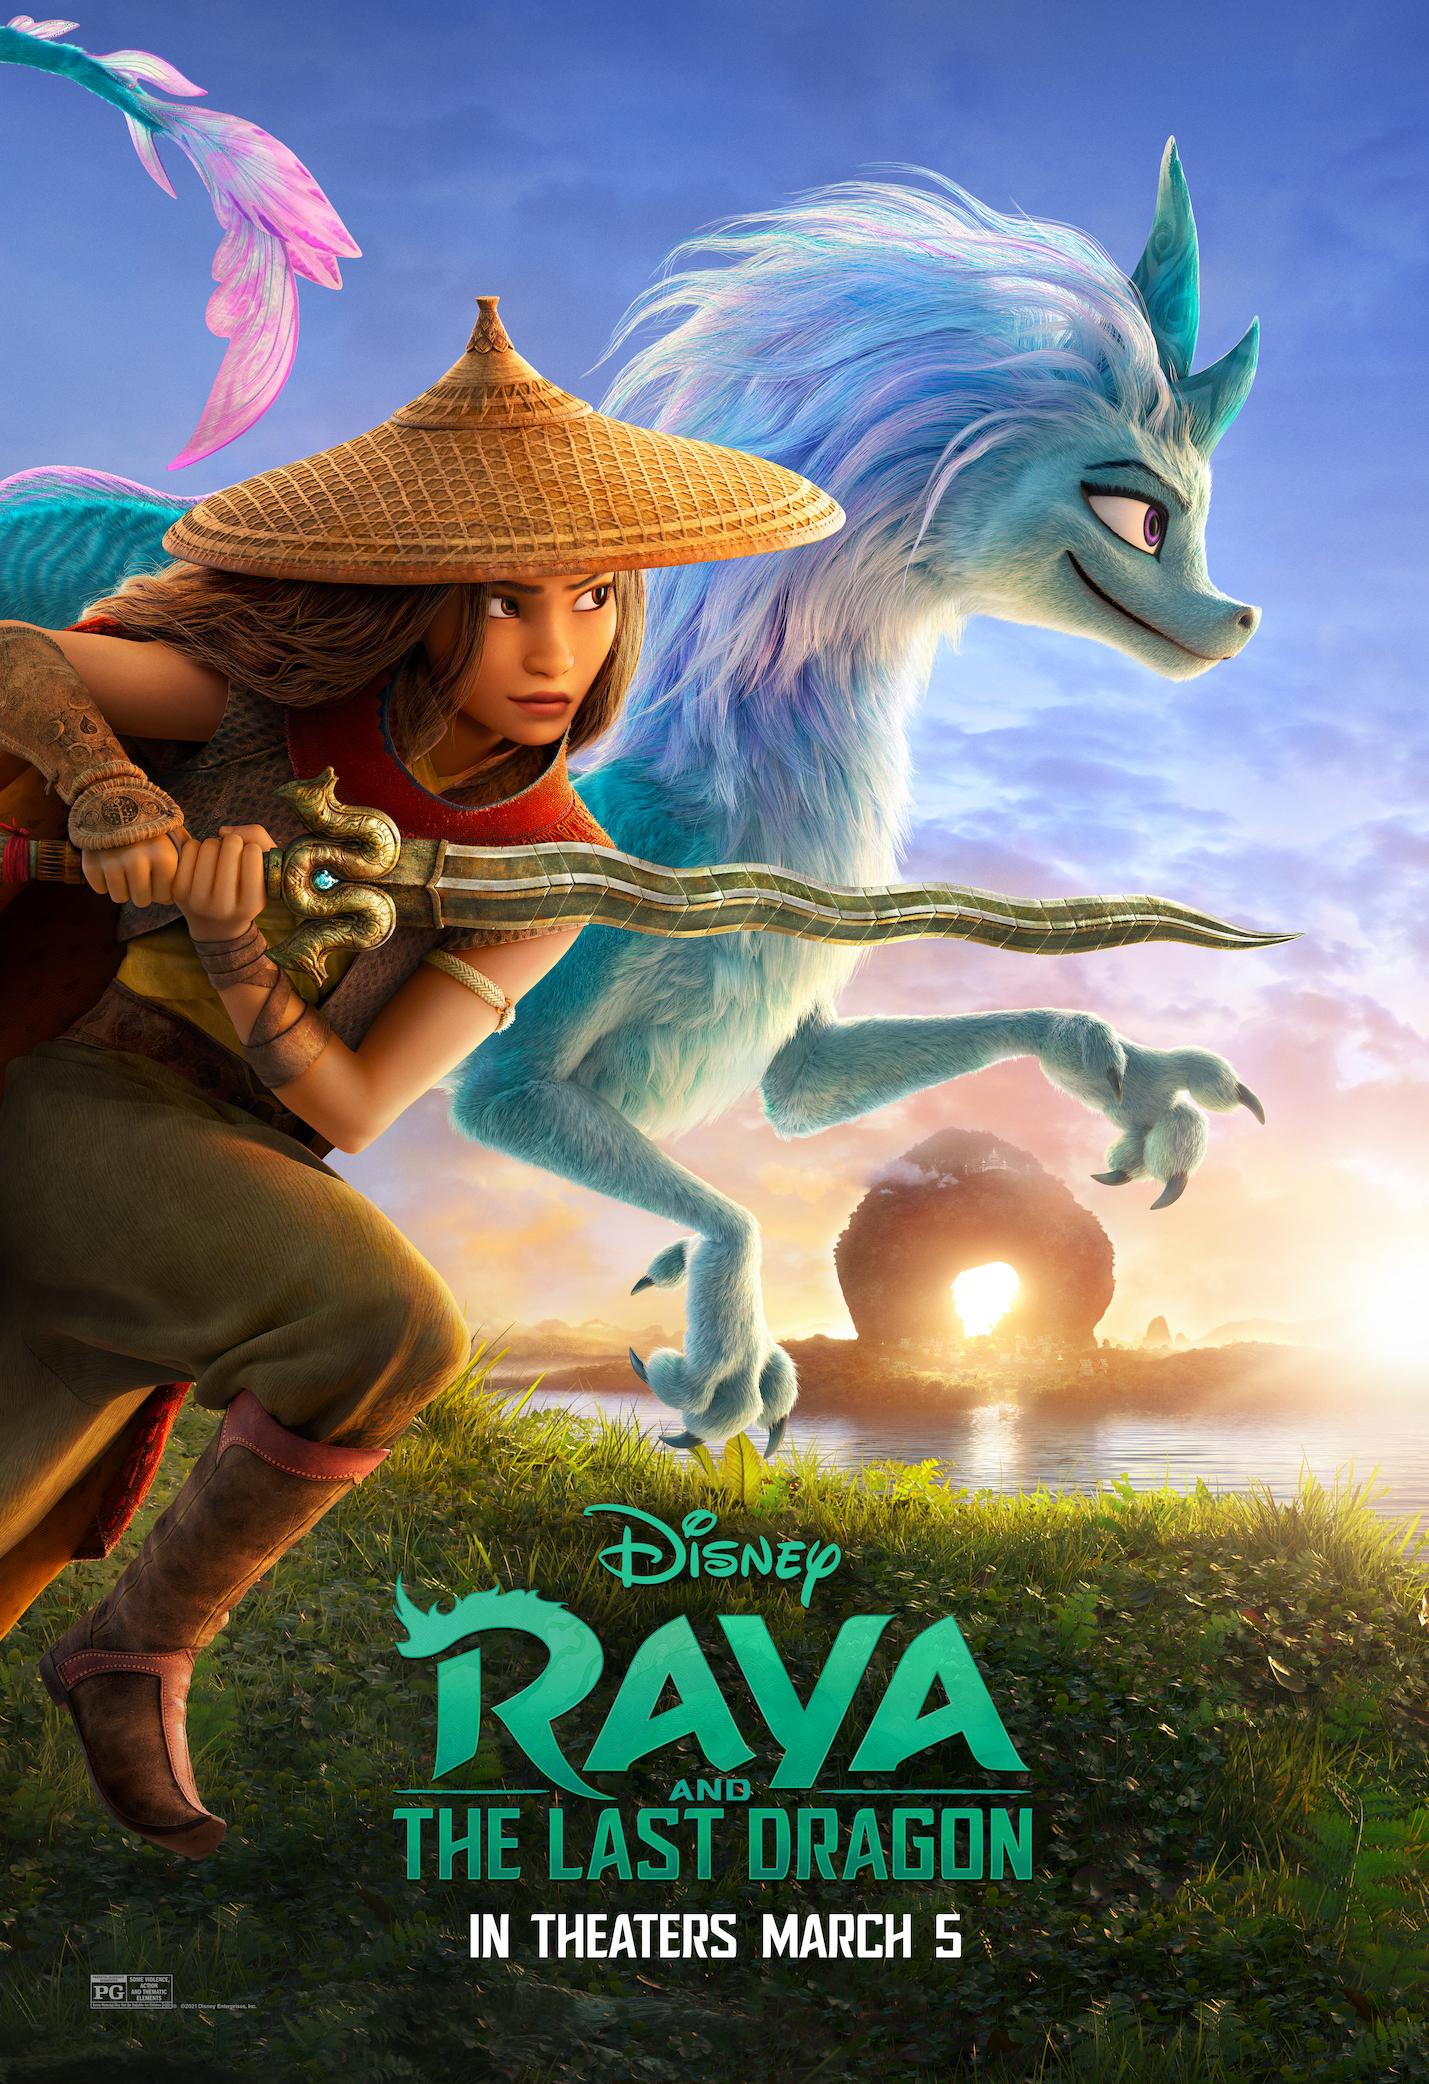 Raya_And_The_Last_Dragon_Raya_And_The_Last_Dragon_-_One_Sheet